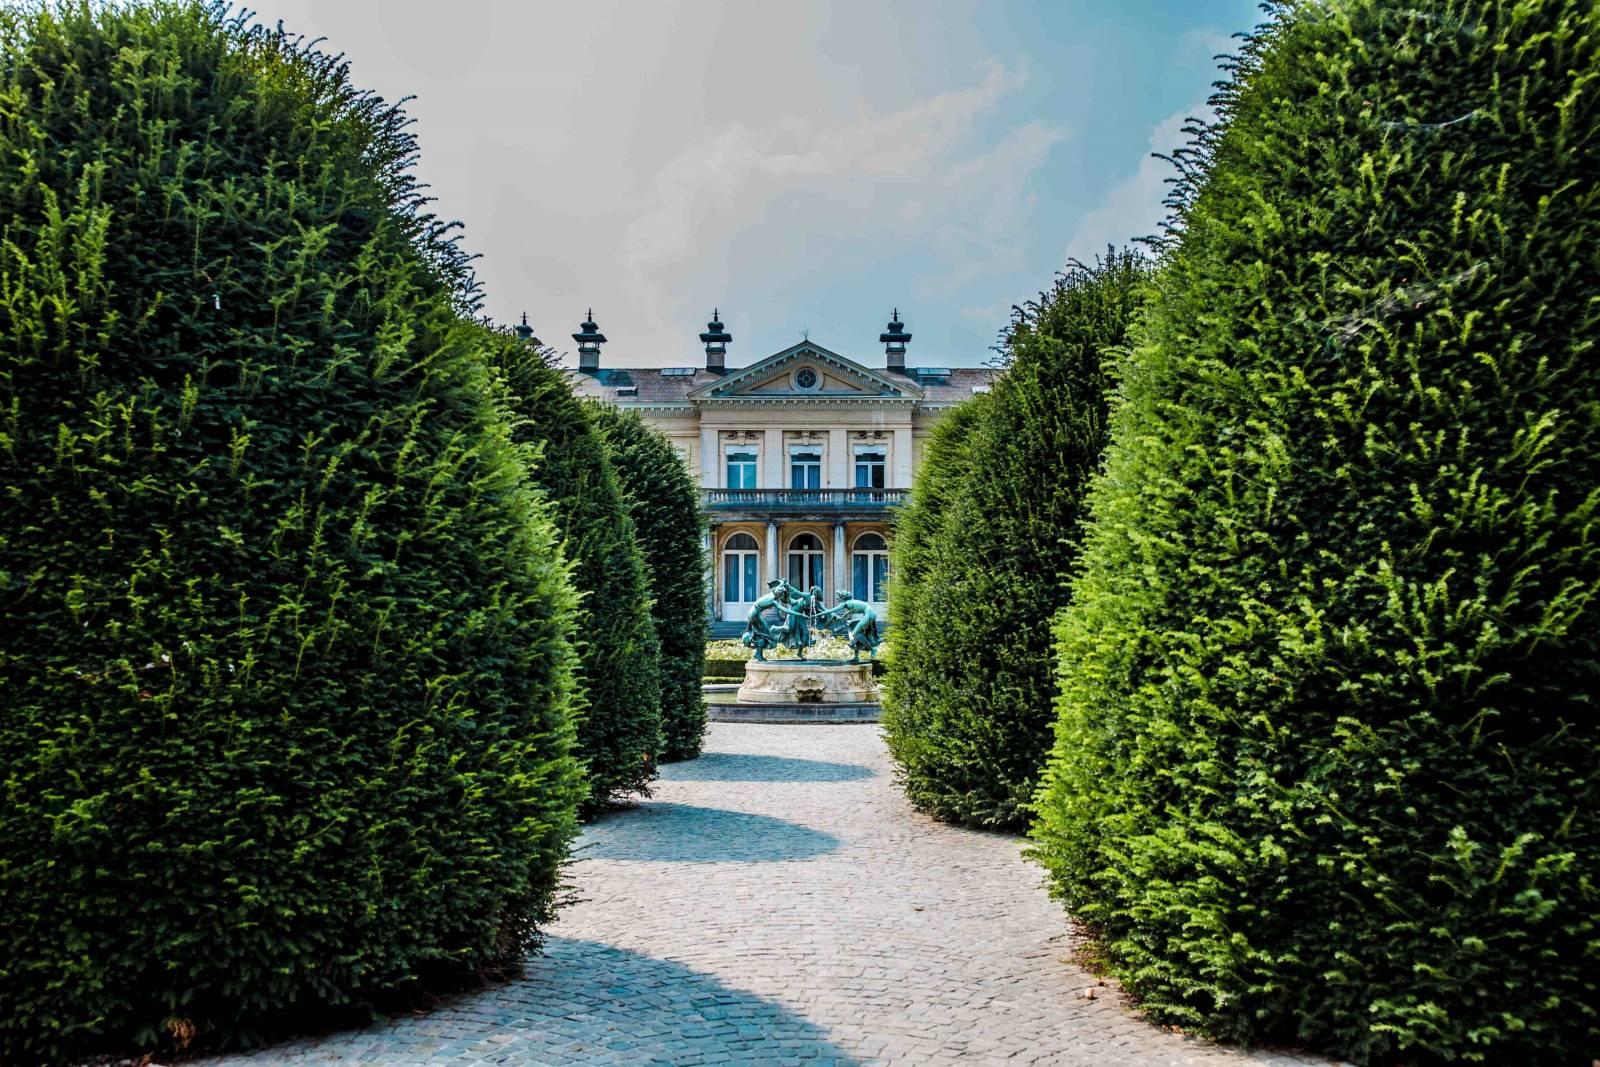 Kasteel Den Brandt - Feestzaal - Trouwzaal - Kasteel - House of Weddings - 19